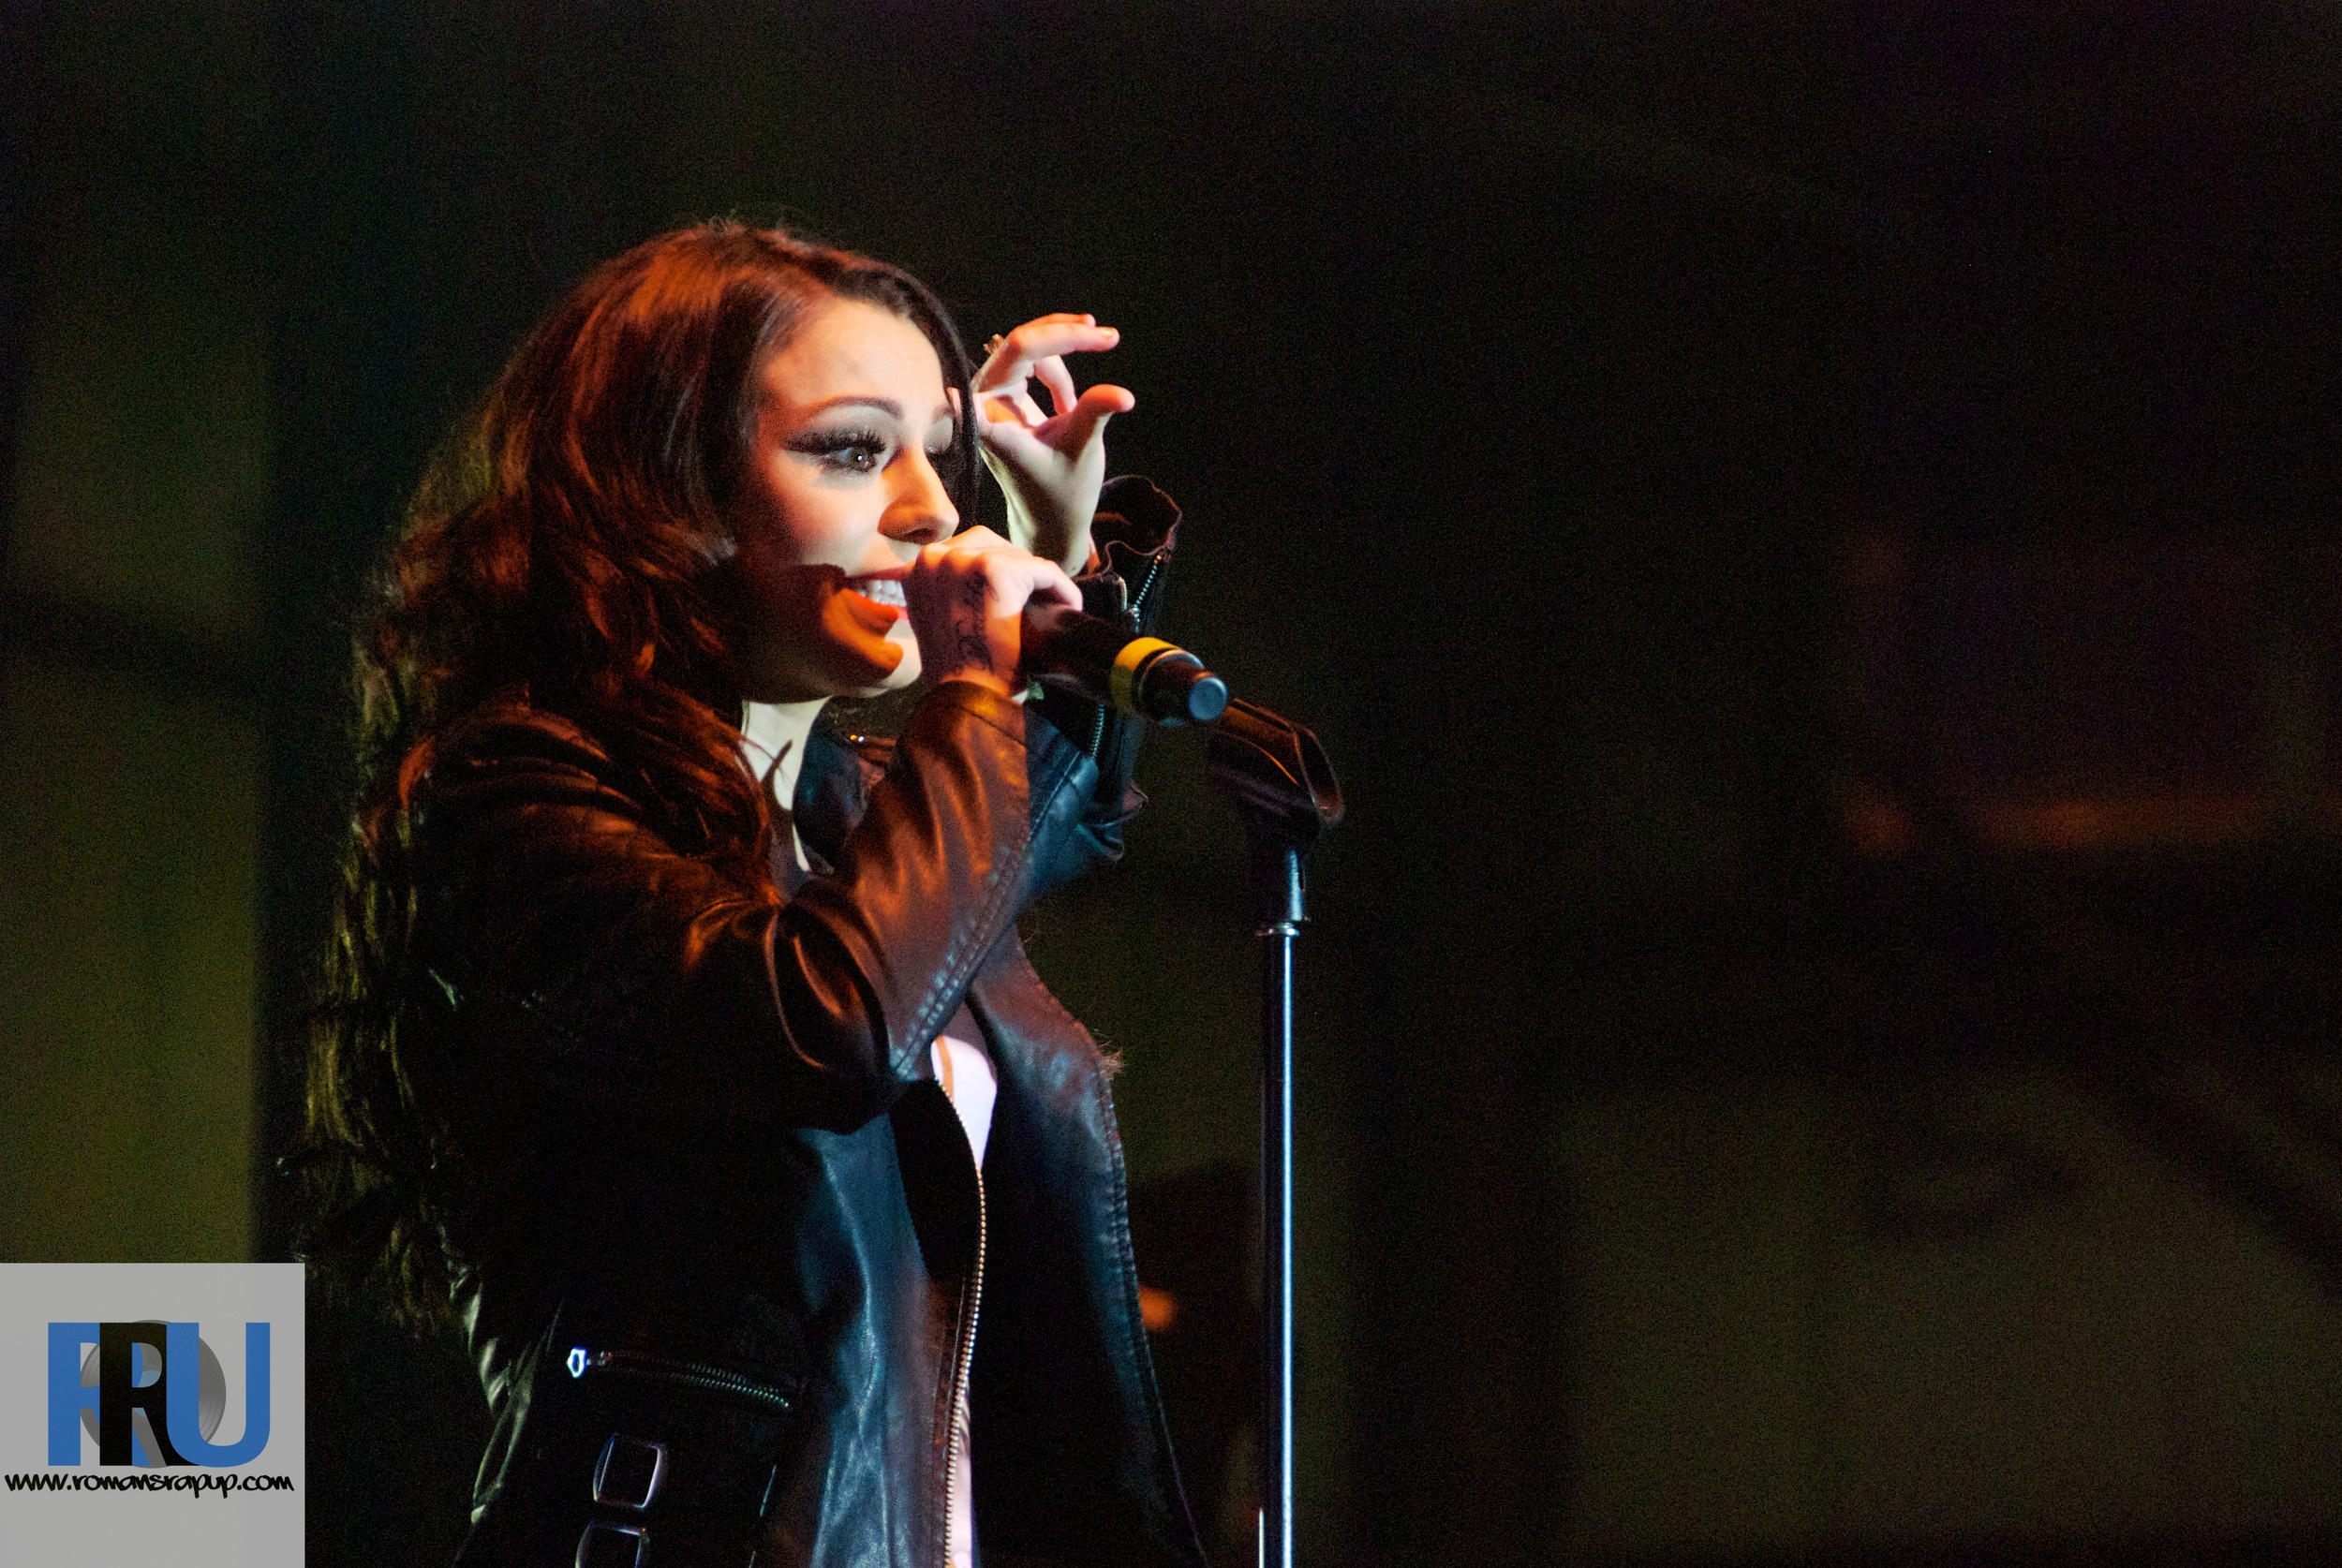 Cher Lloyd Topsfield Fair 10-12-13 10.jpg